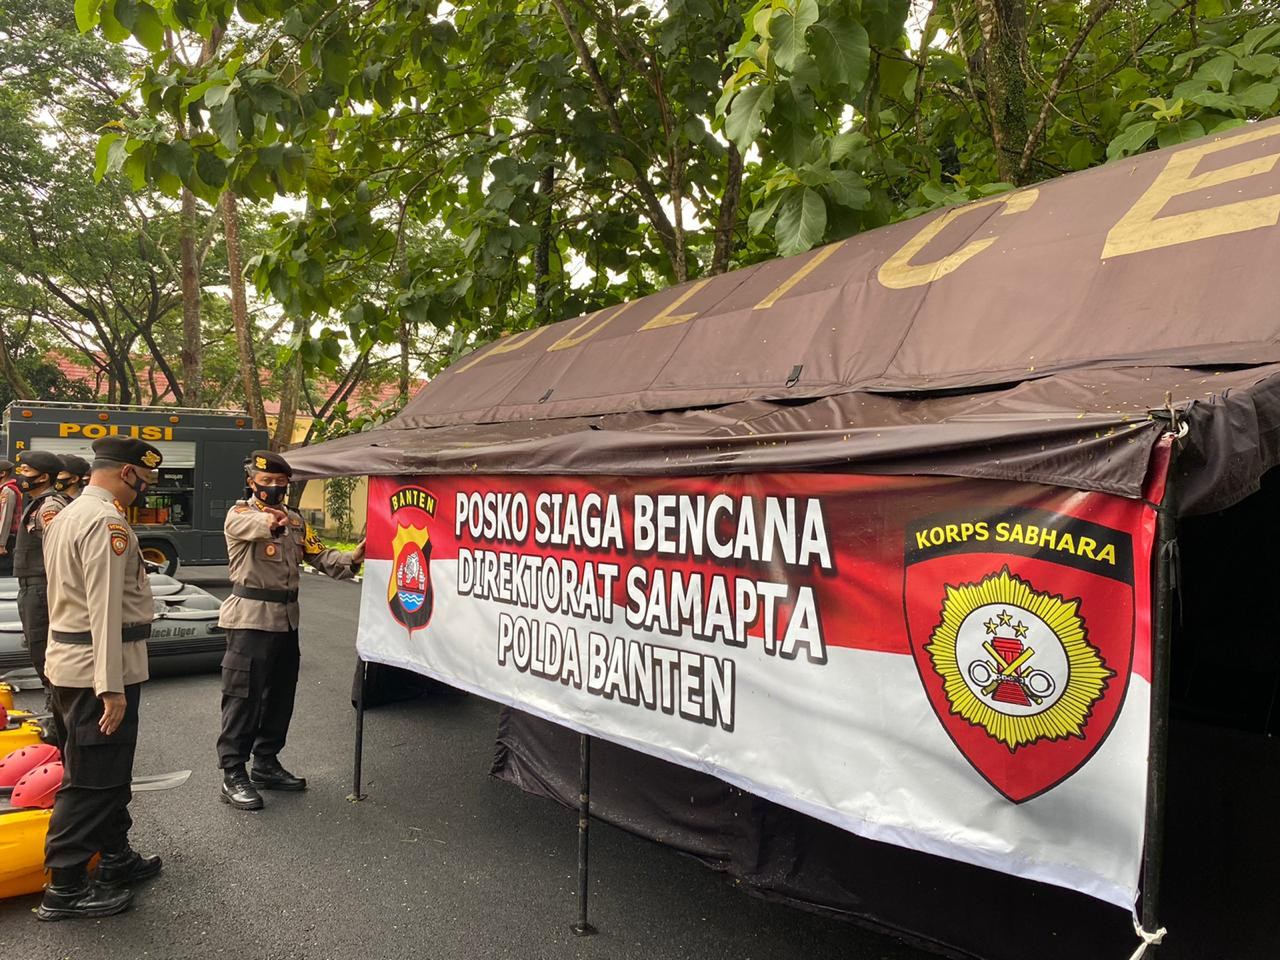 Antisipasi Kontijensi Bencana Alam, Ditsamapta Polda Banten Lakukan Apel Kesiapsiagaan